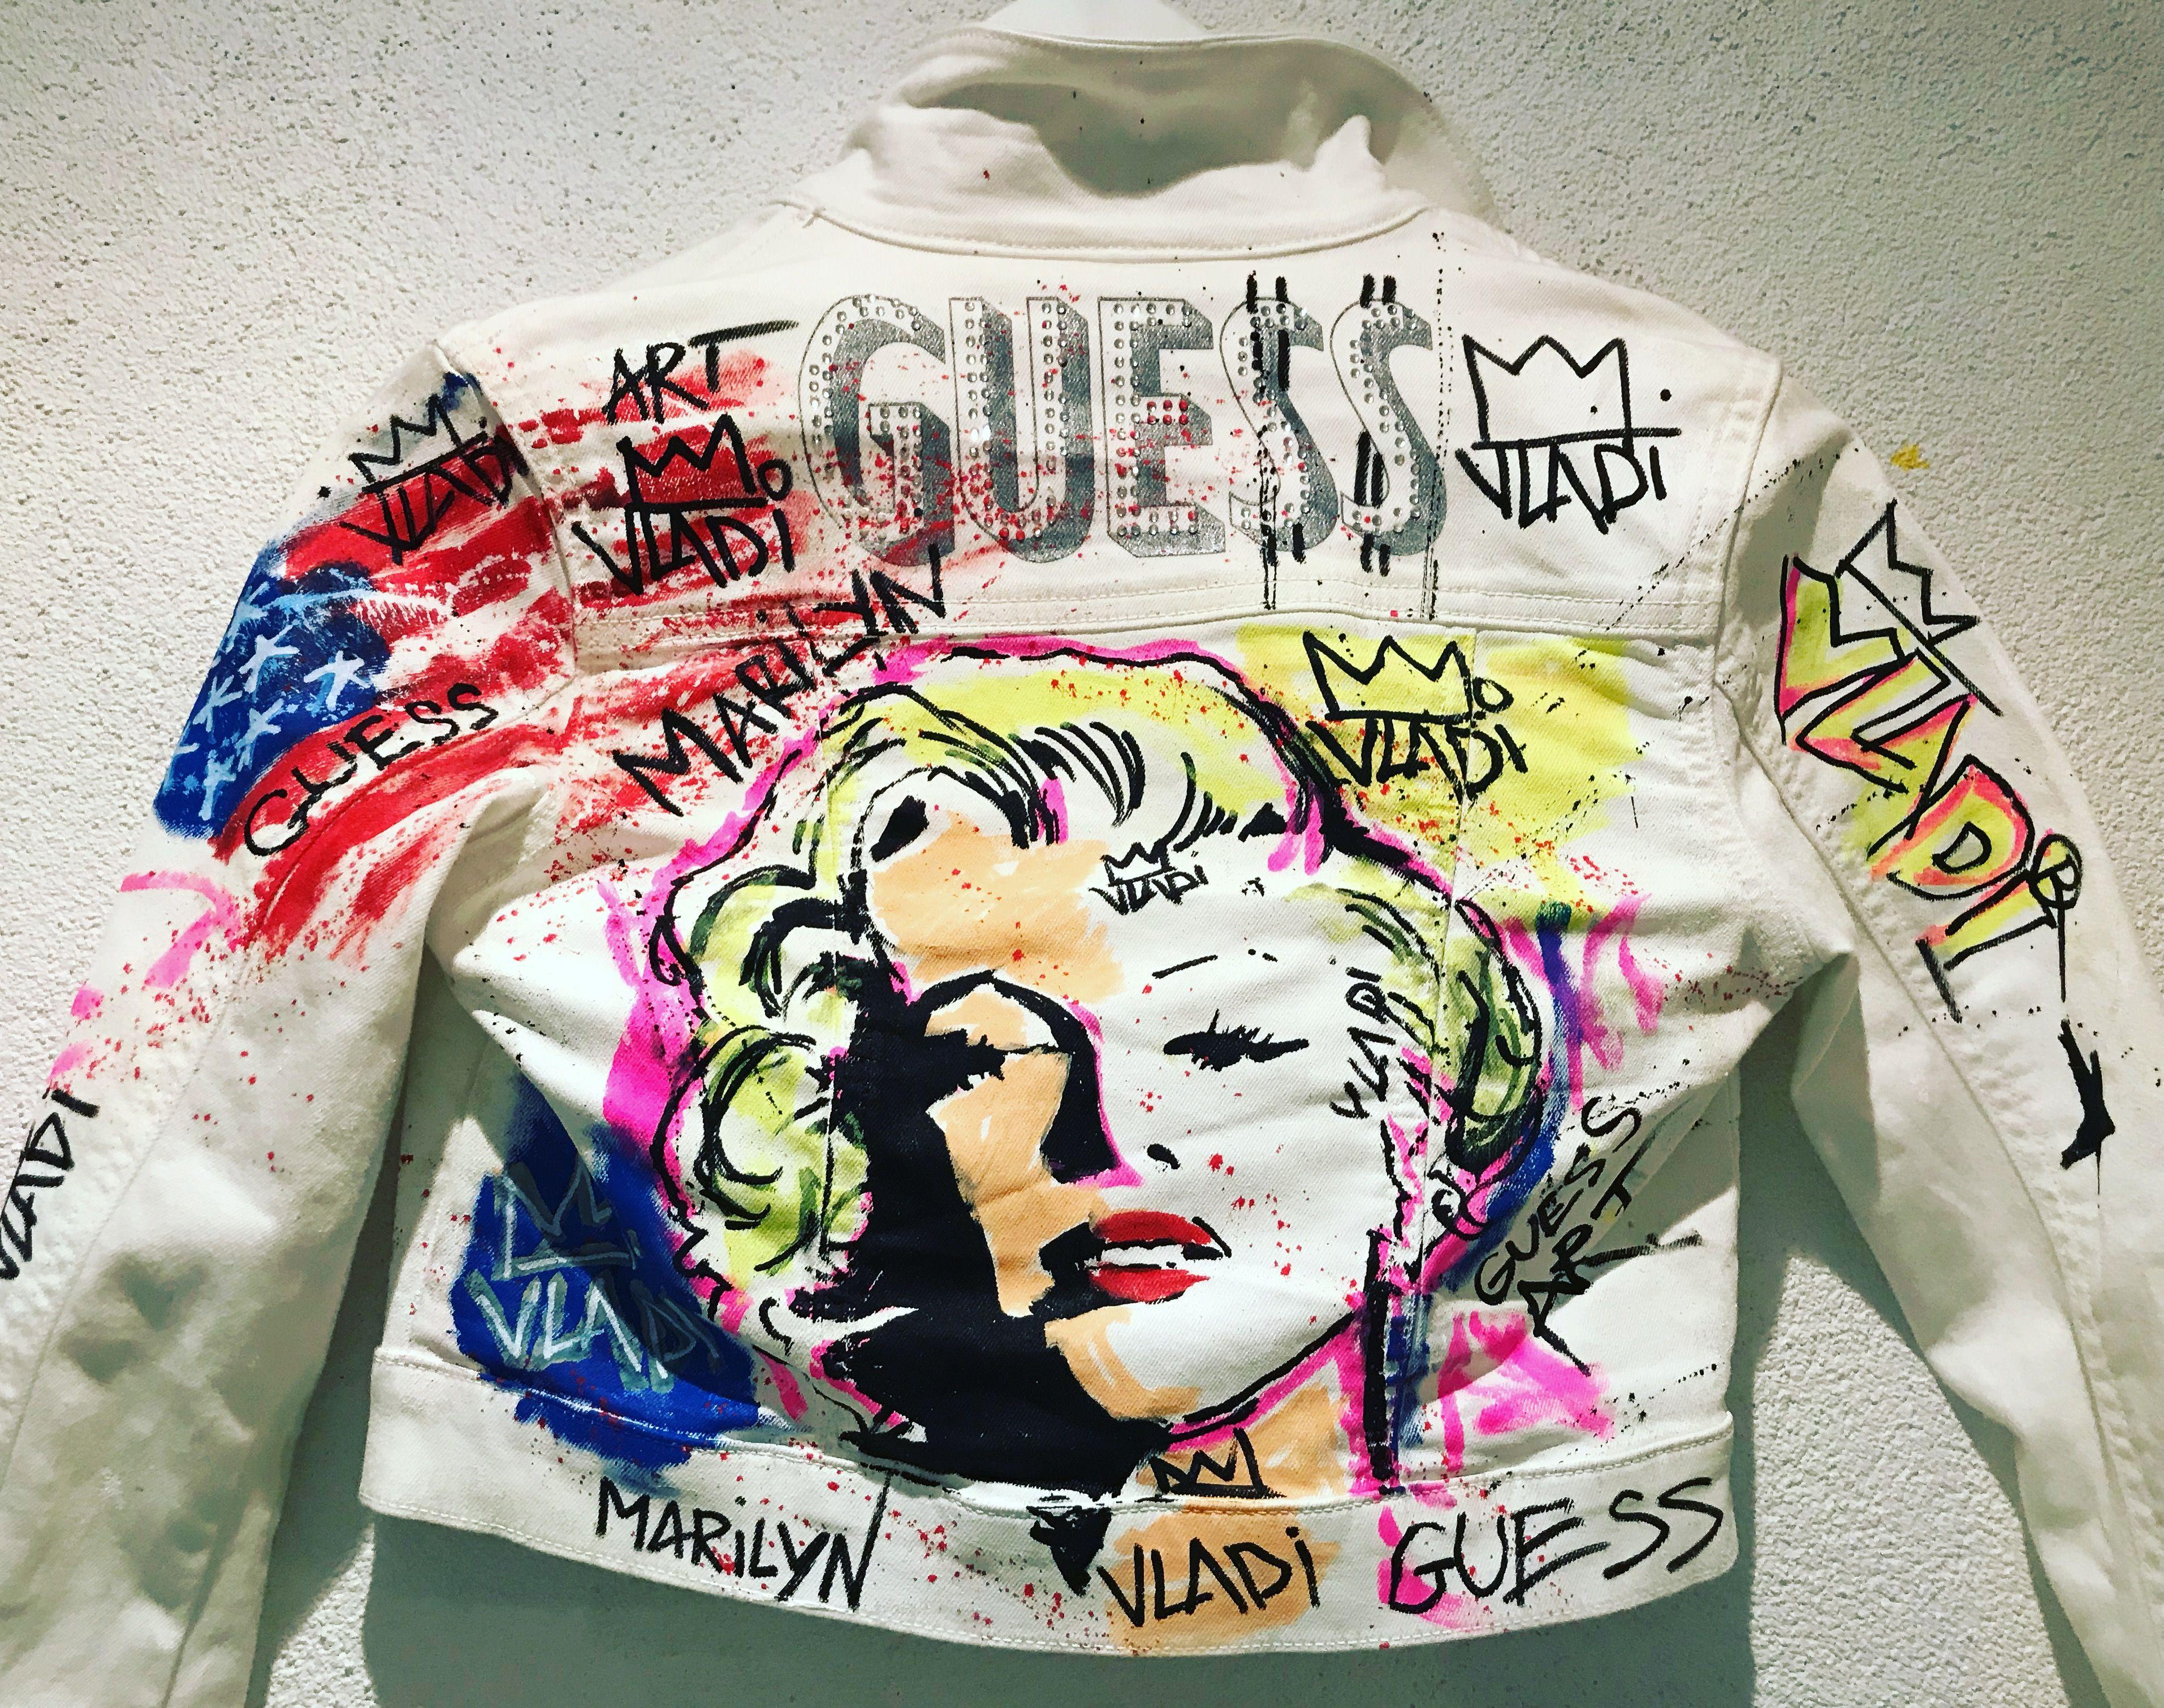 Marilyn Monroe Guess Artvladi Guess Artvladi Fashion Fashionart Fashionstyle Art Popart Jeans Painted Jacket Outerwear Jackets Fashion [ 3021 x 3827 Pixel ]